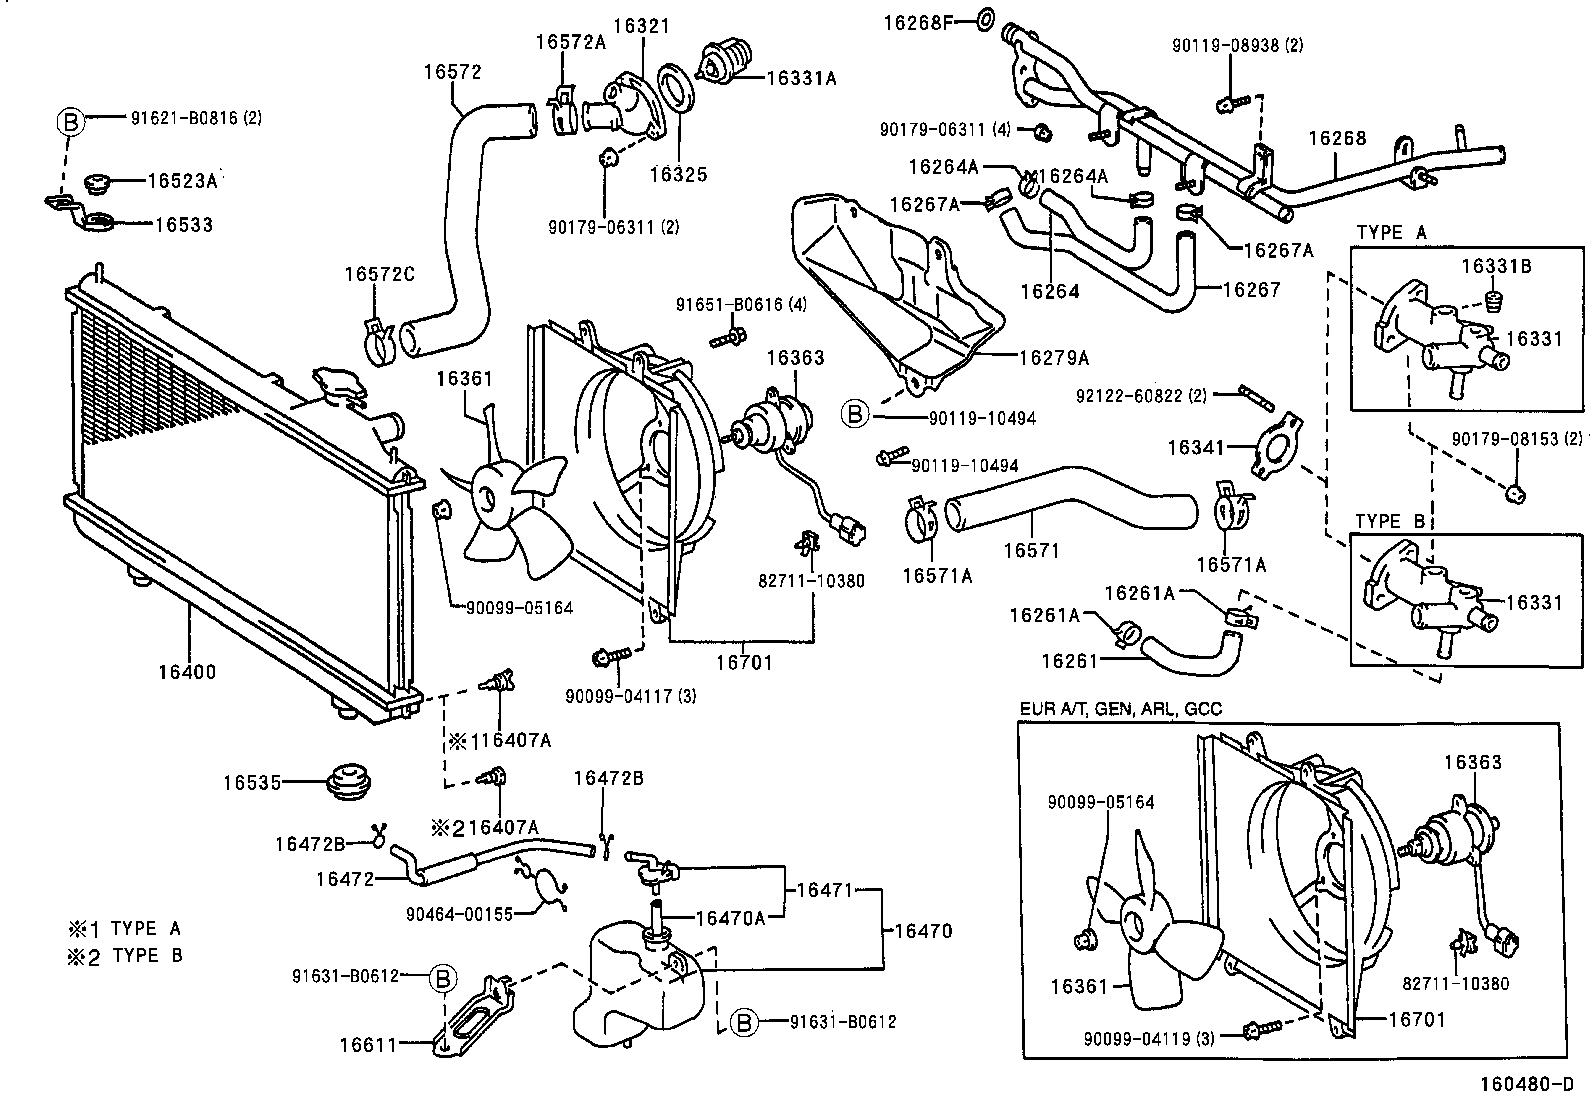 toyota rav4sxa11l-awmgk - tool-engine-fuel - radiator water outlet | japan  parts eu  japan parts eu